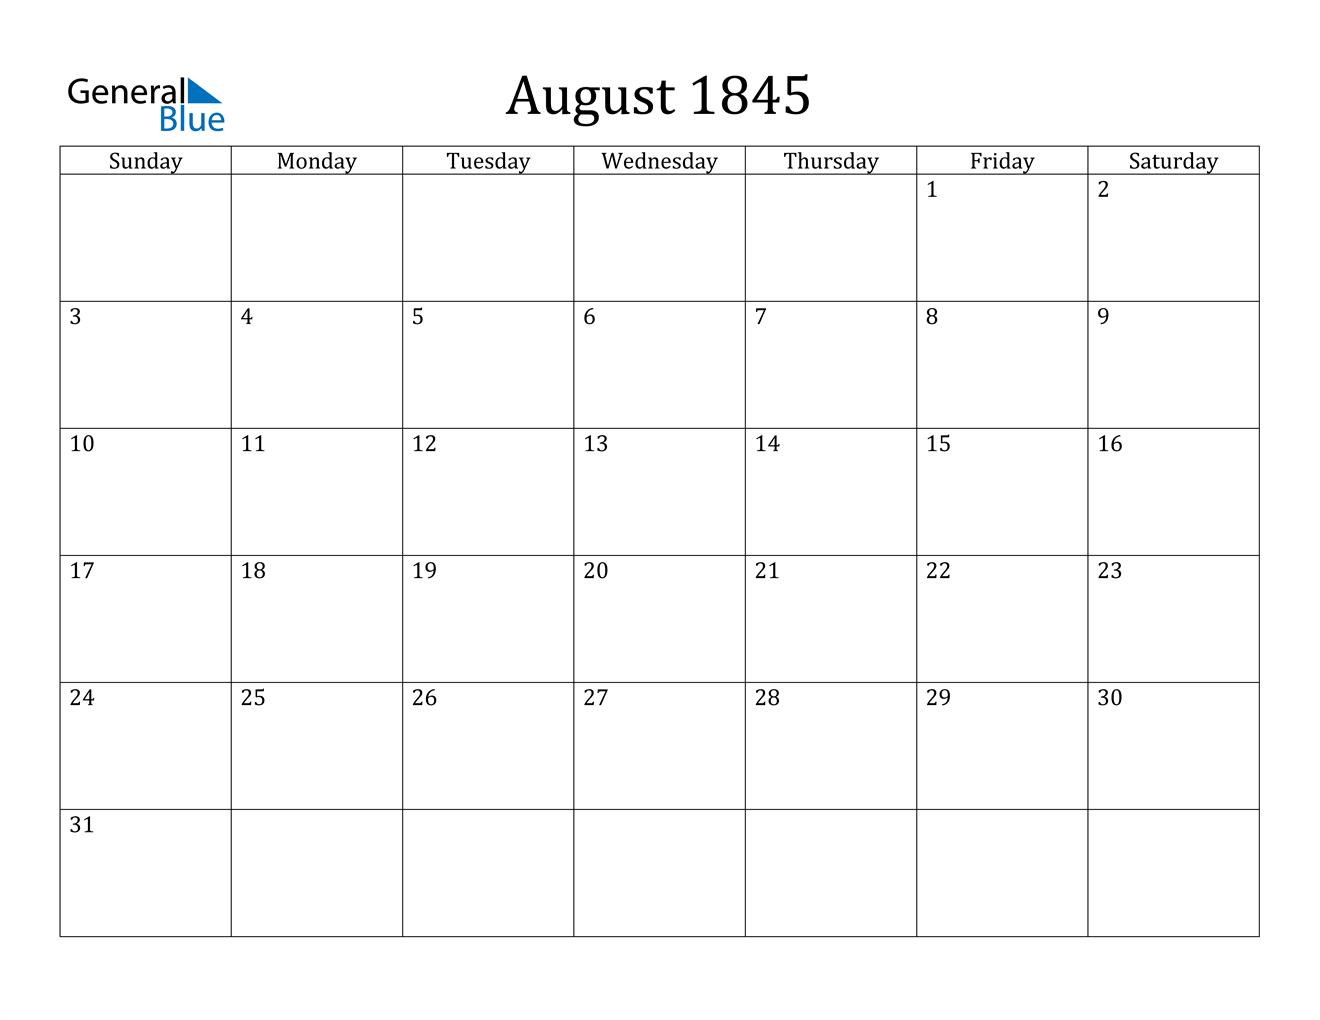 Image of August 1845 Calendar